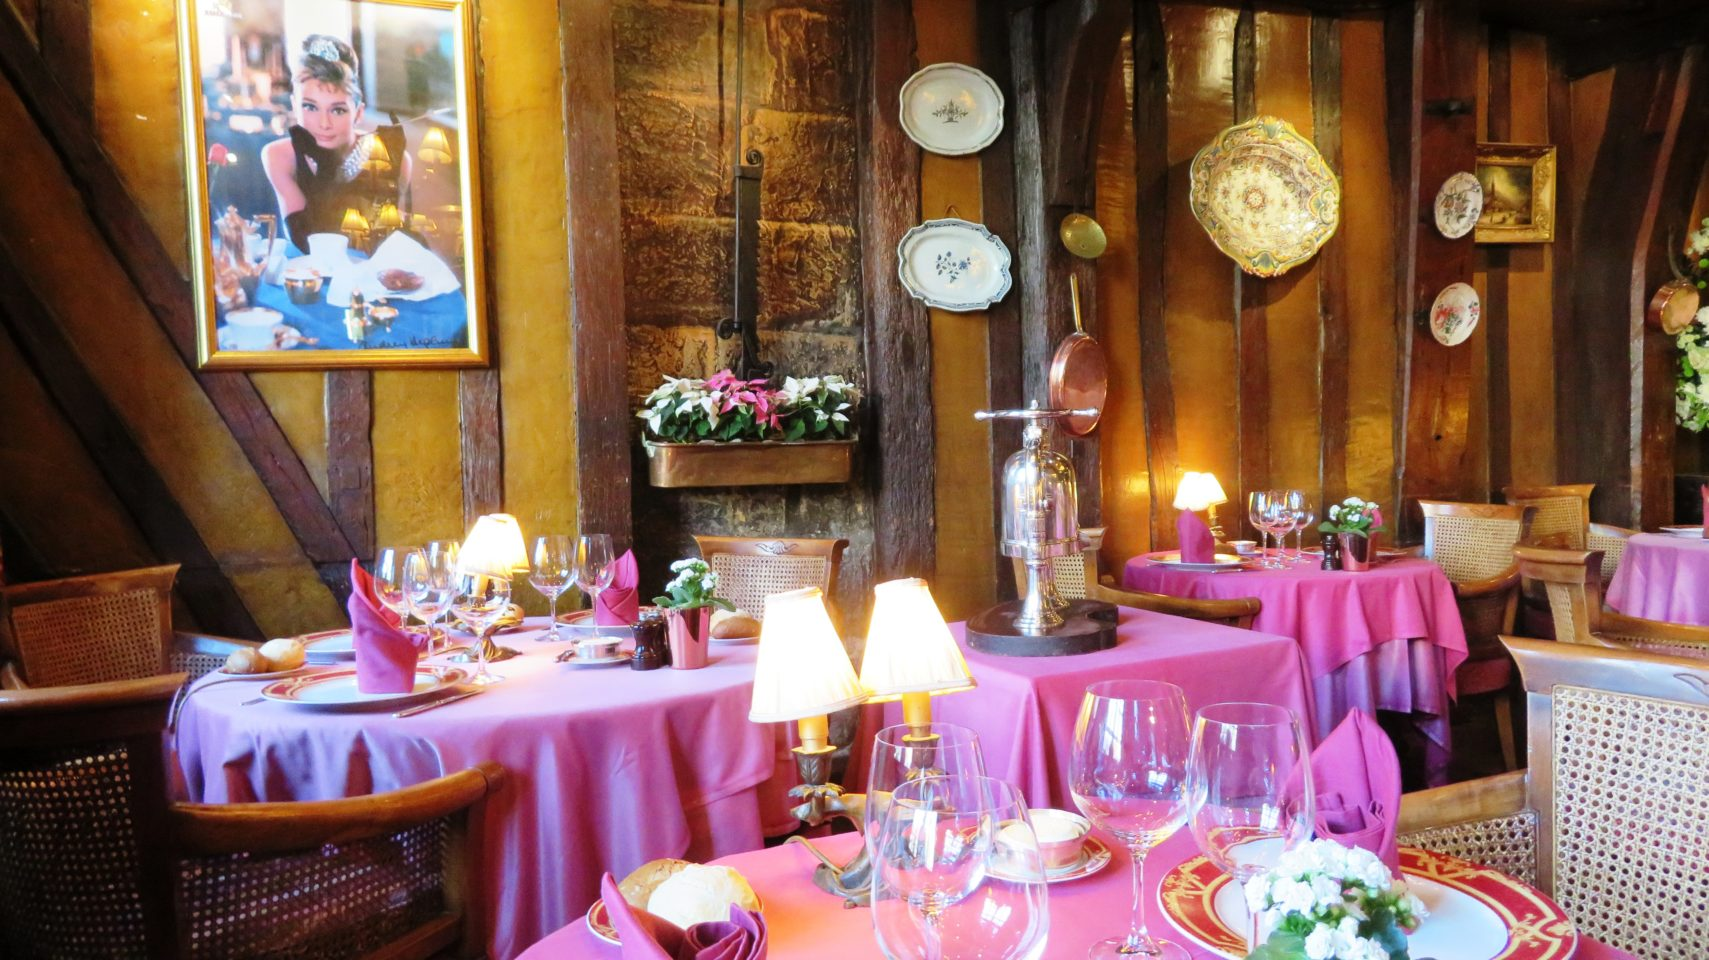 La Couronne restaurant in Rouen, Normandie, France (Paris and Normandie AMAWaterways Cruise)